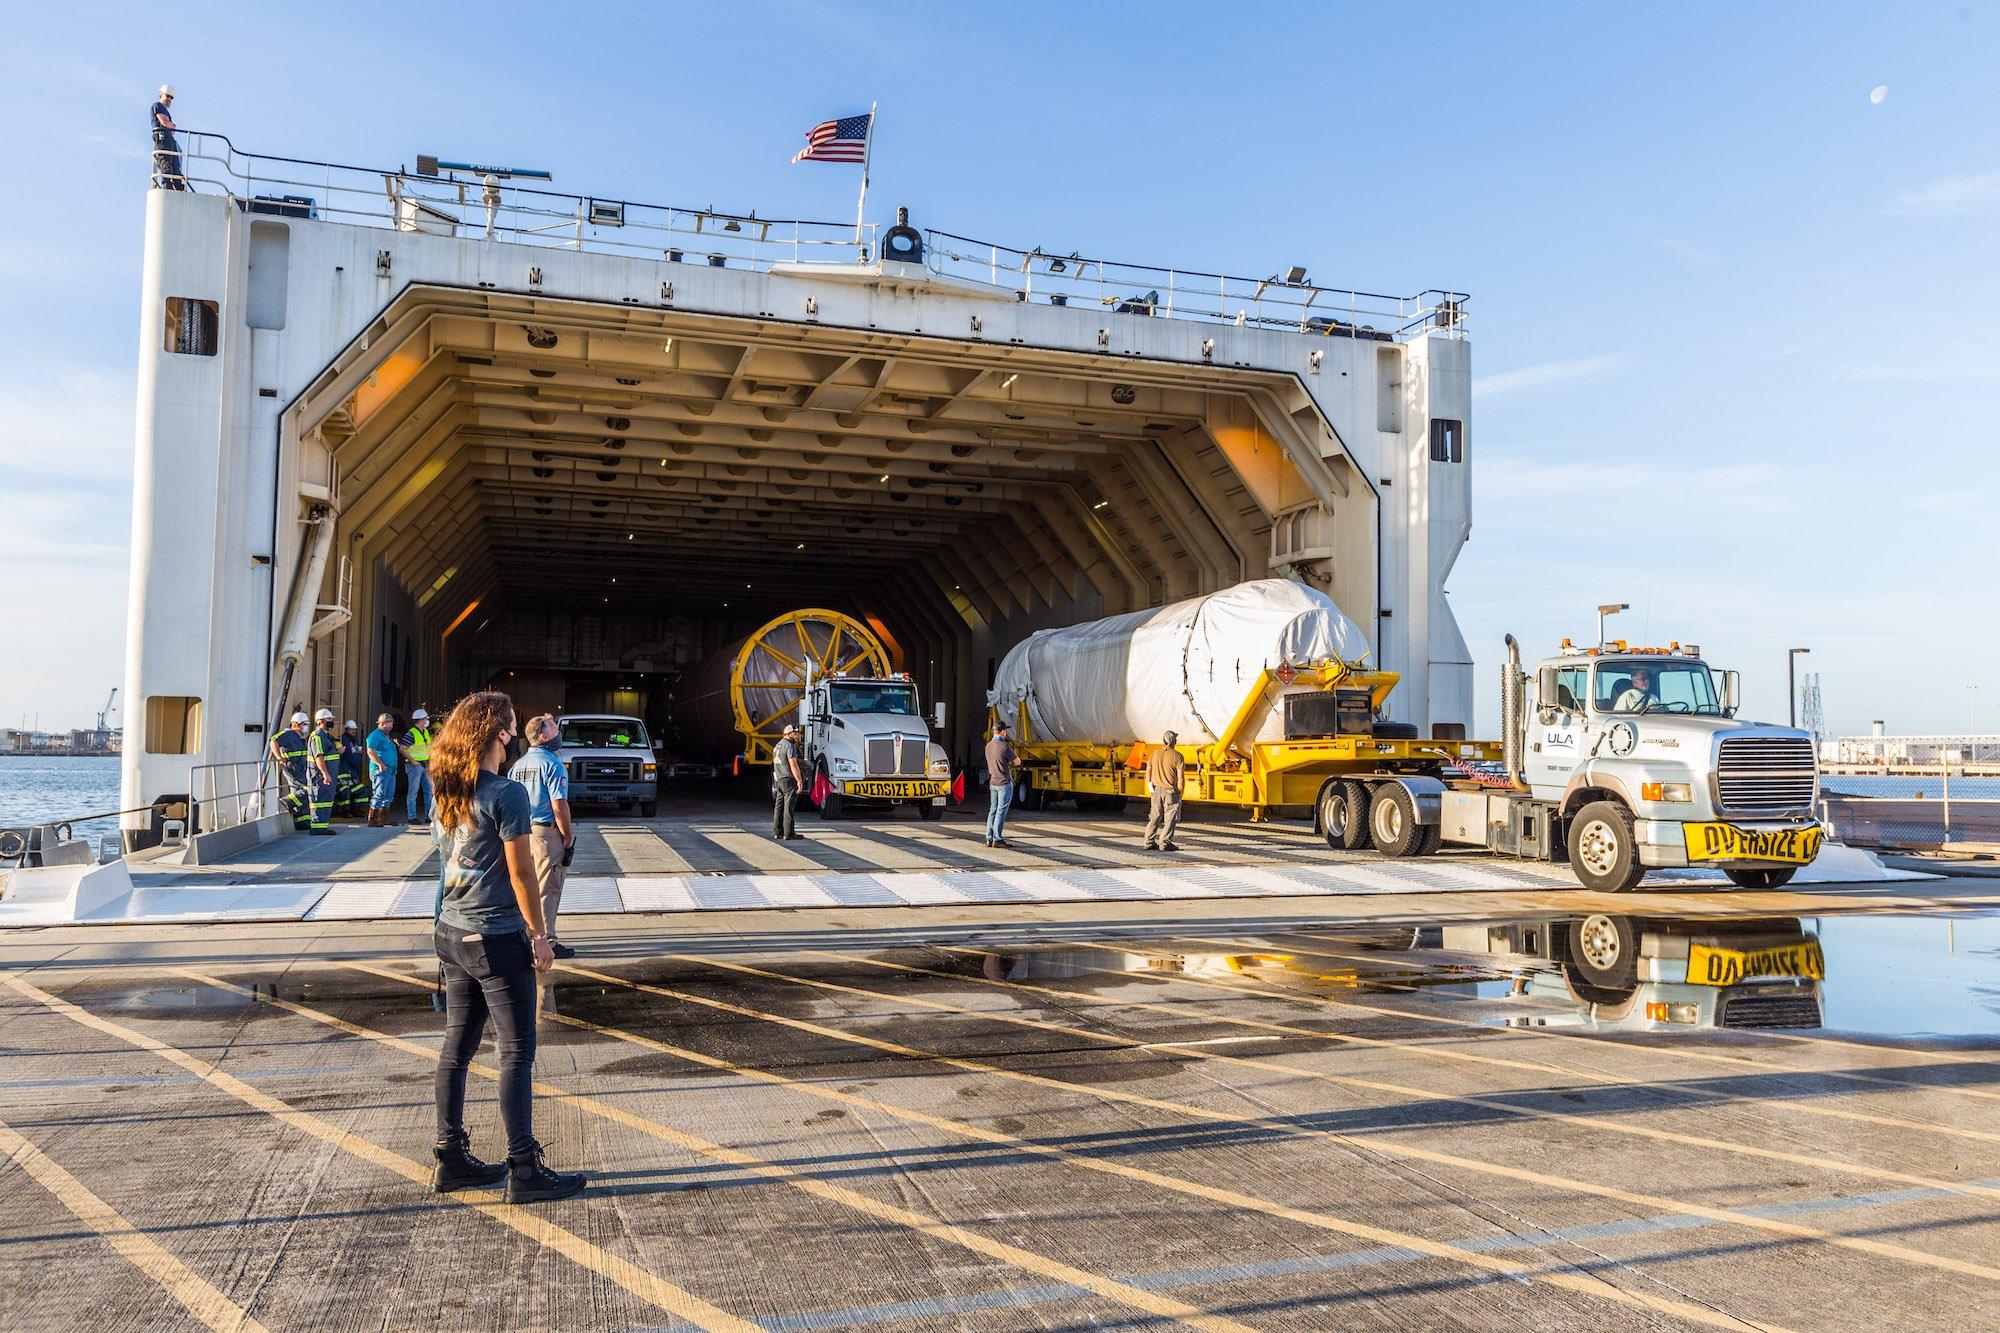 Centaur emerges from RocketShip. Photo by United Launch Alliance